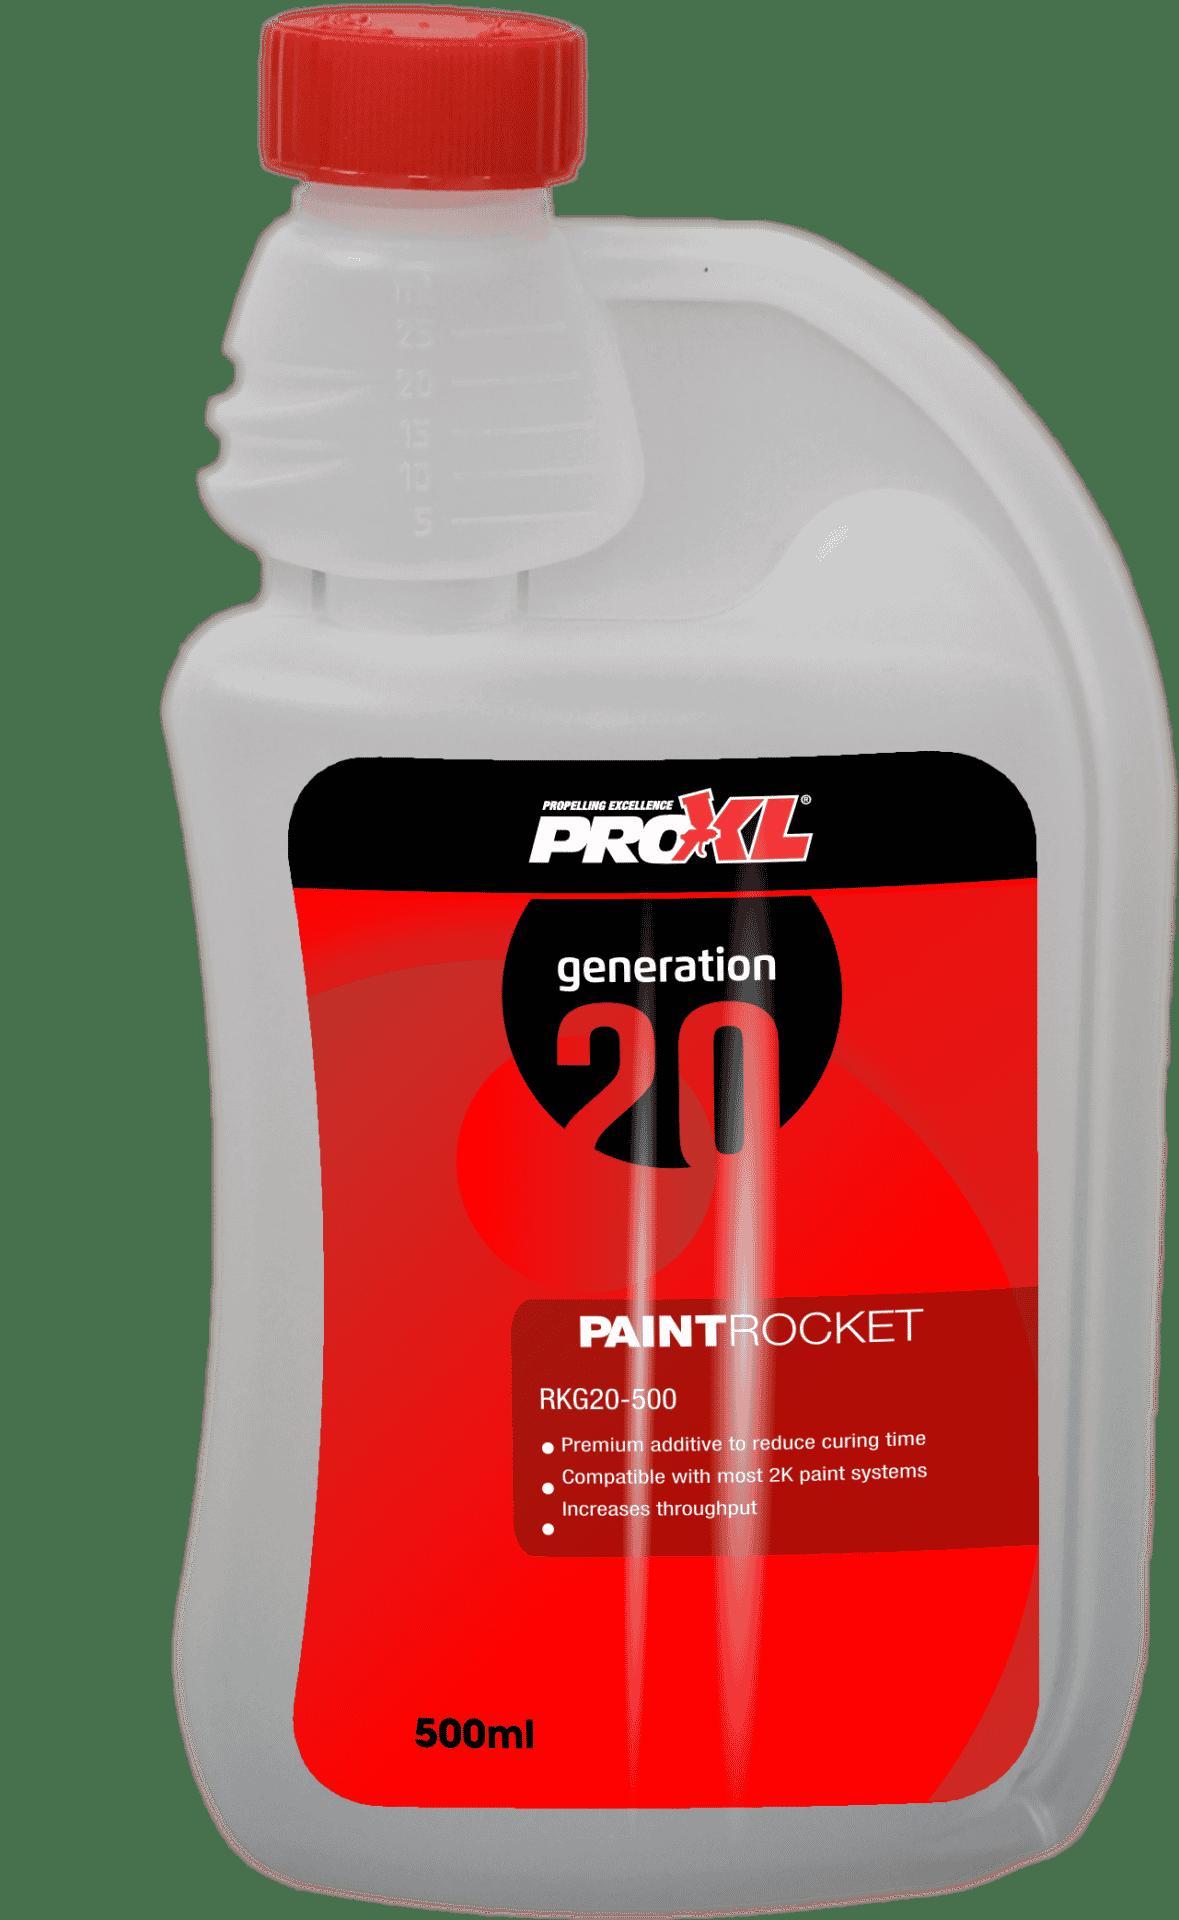 Paint Rocket Product Image